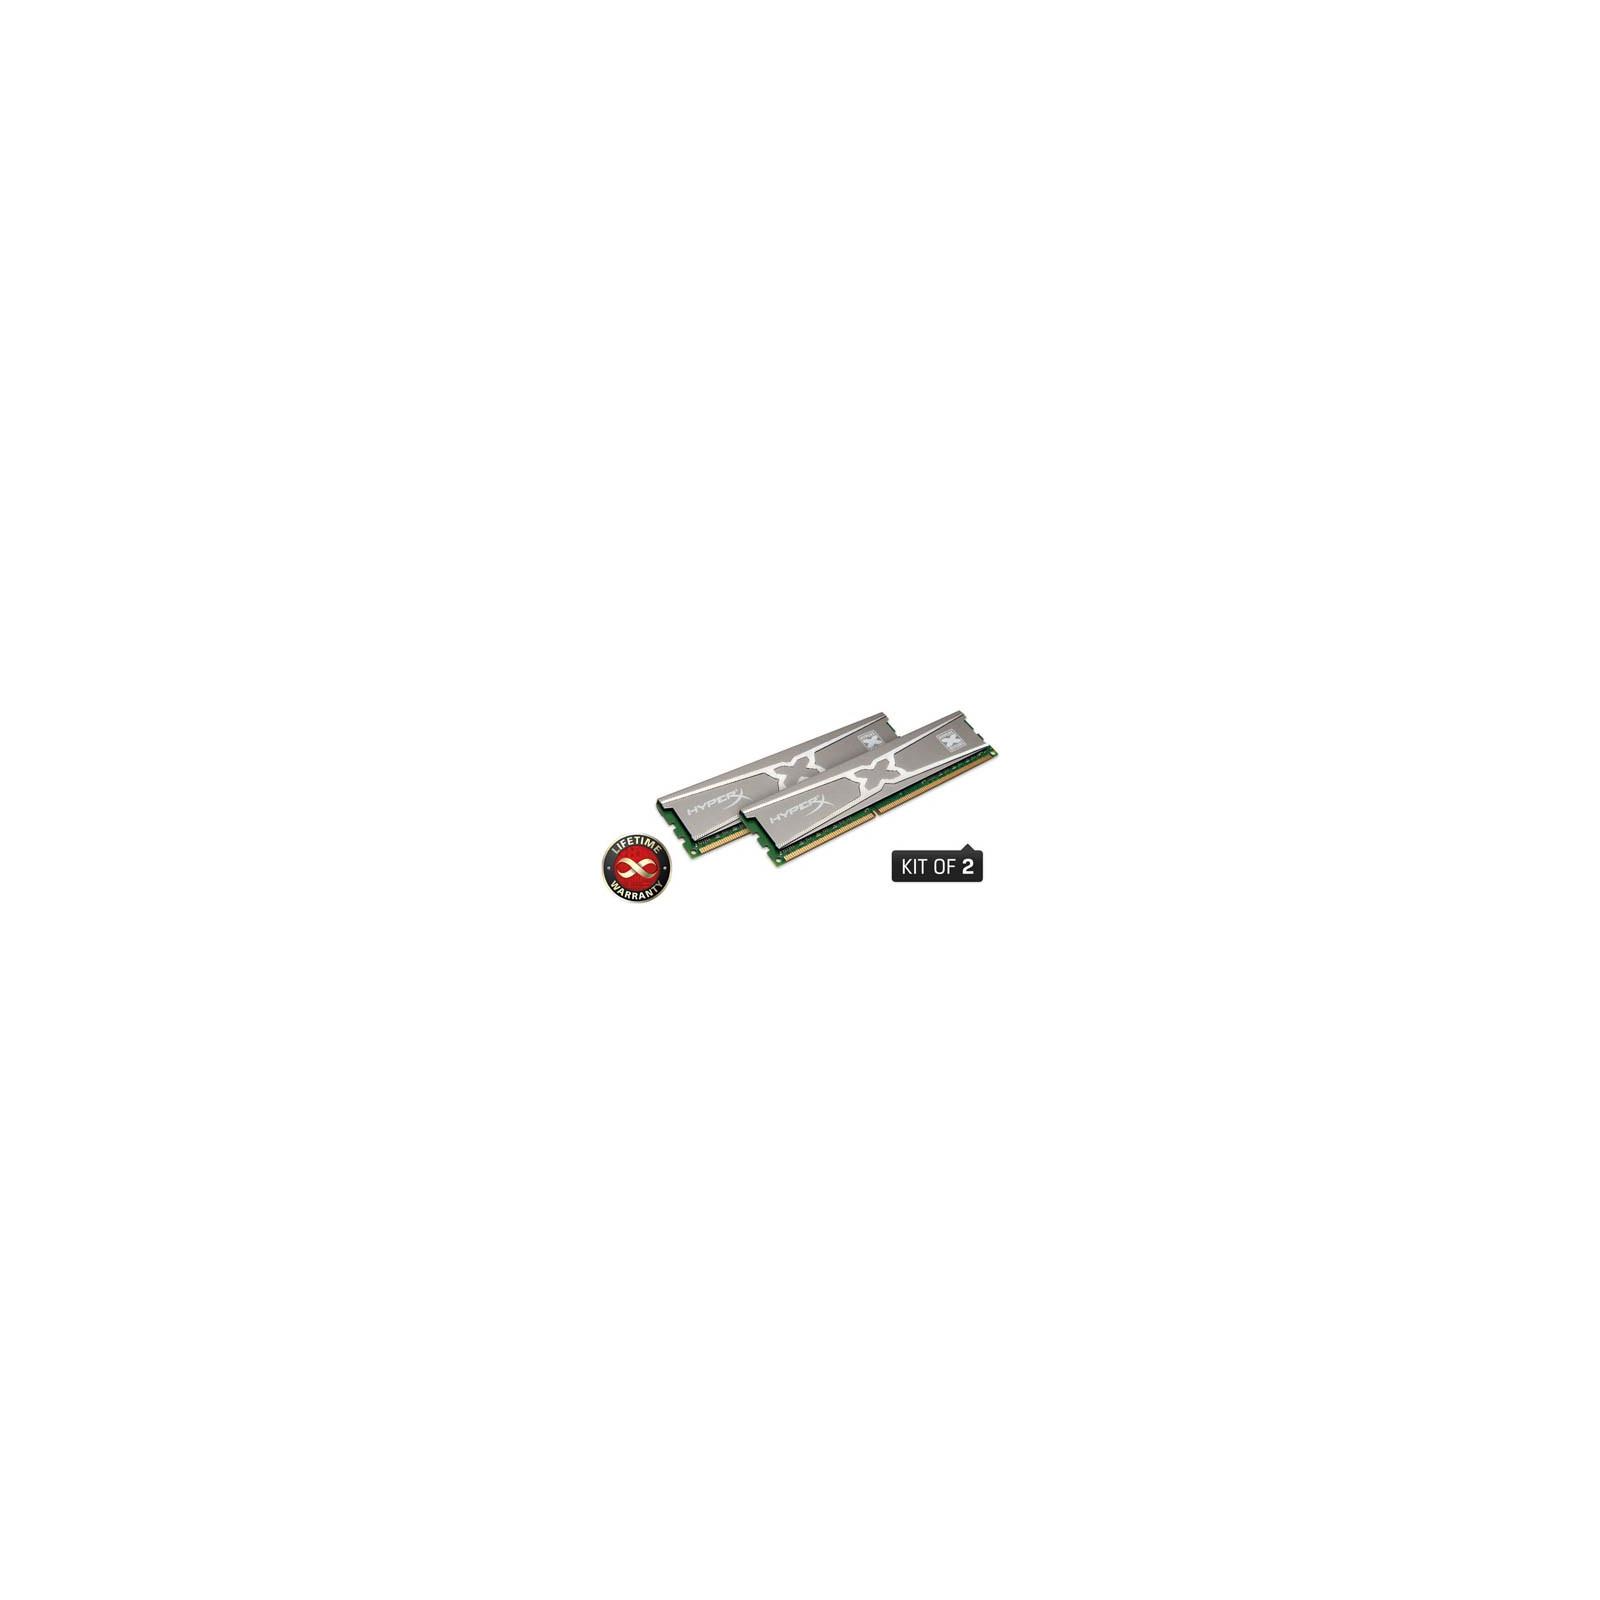 Модуль памяти для компьютера DDR3 16GB (2x8GB) 1600 MHz Kingston (KHX16C9X3K2/16X)